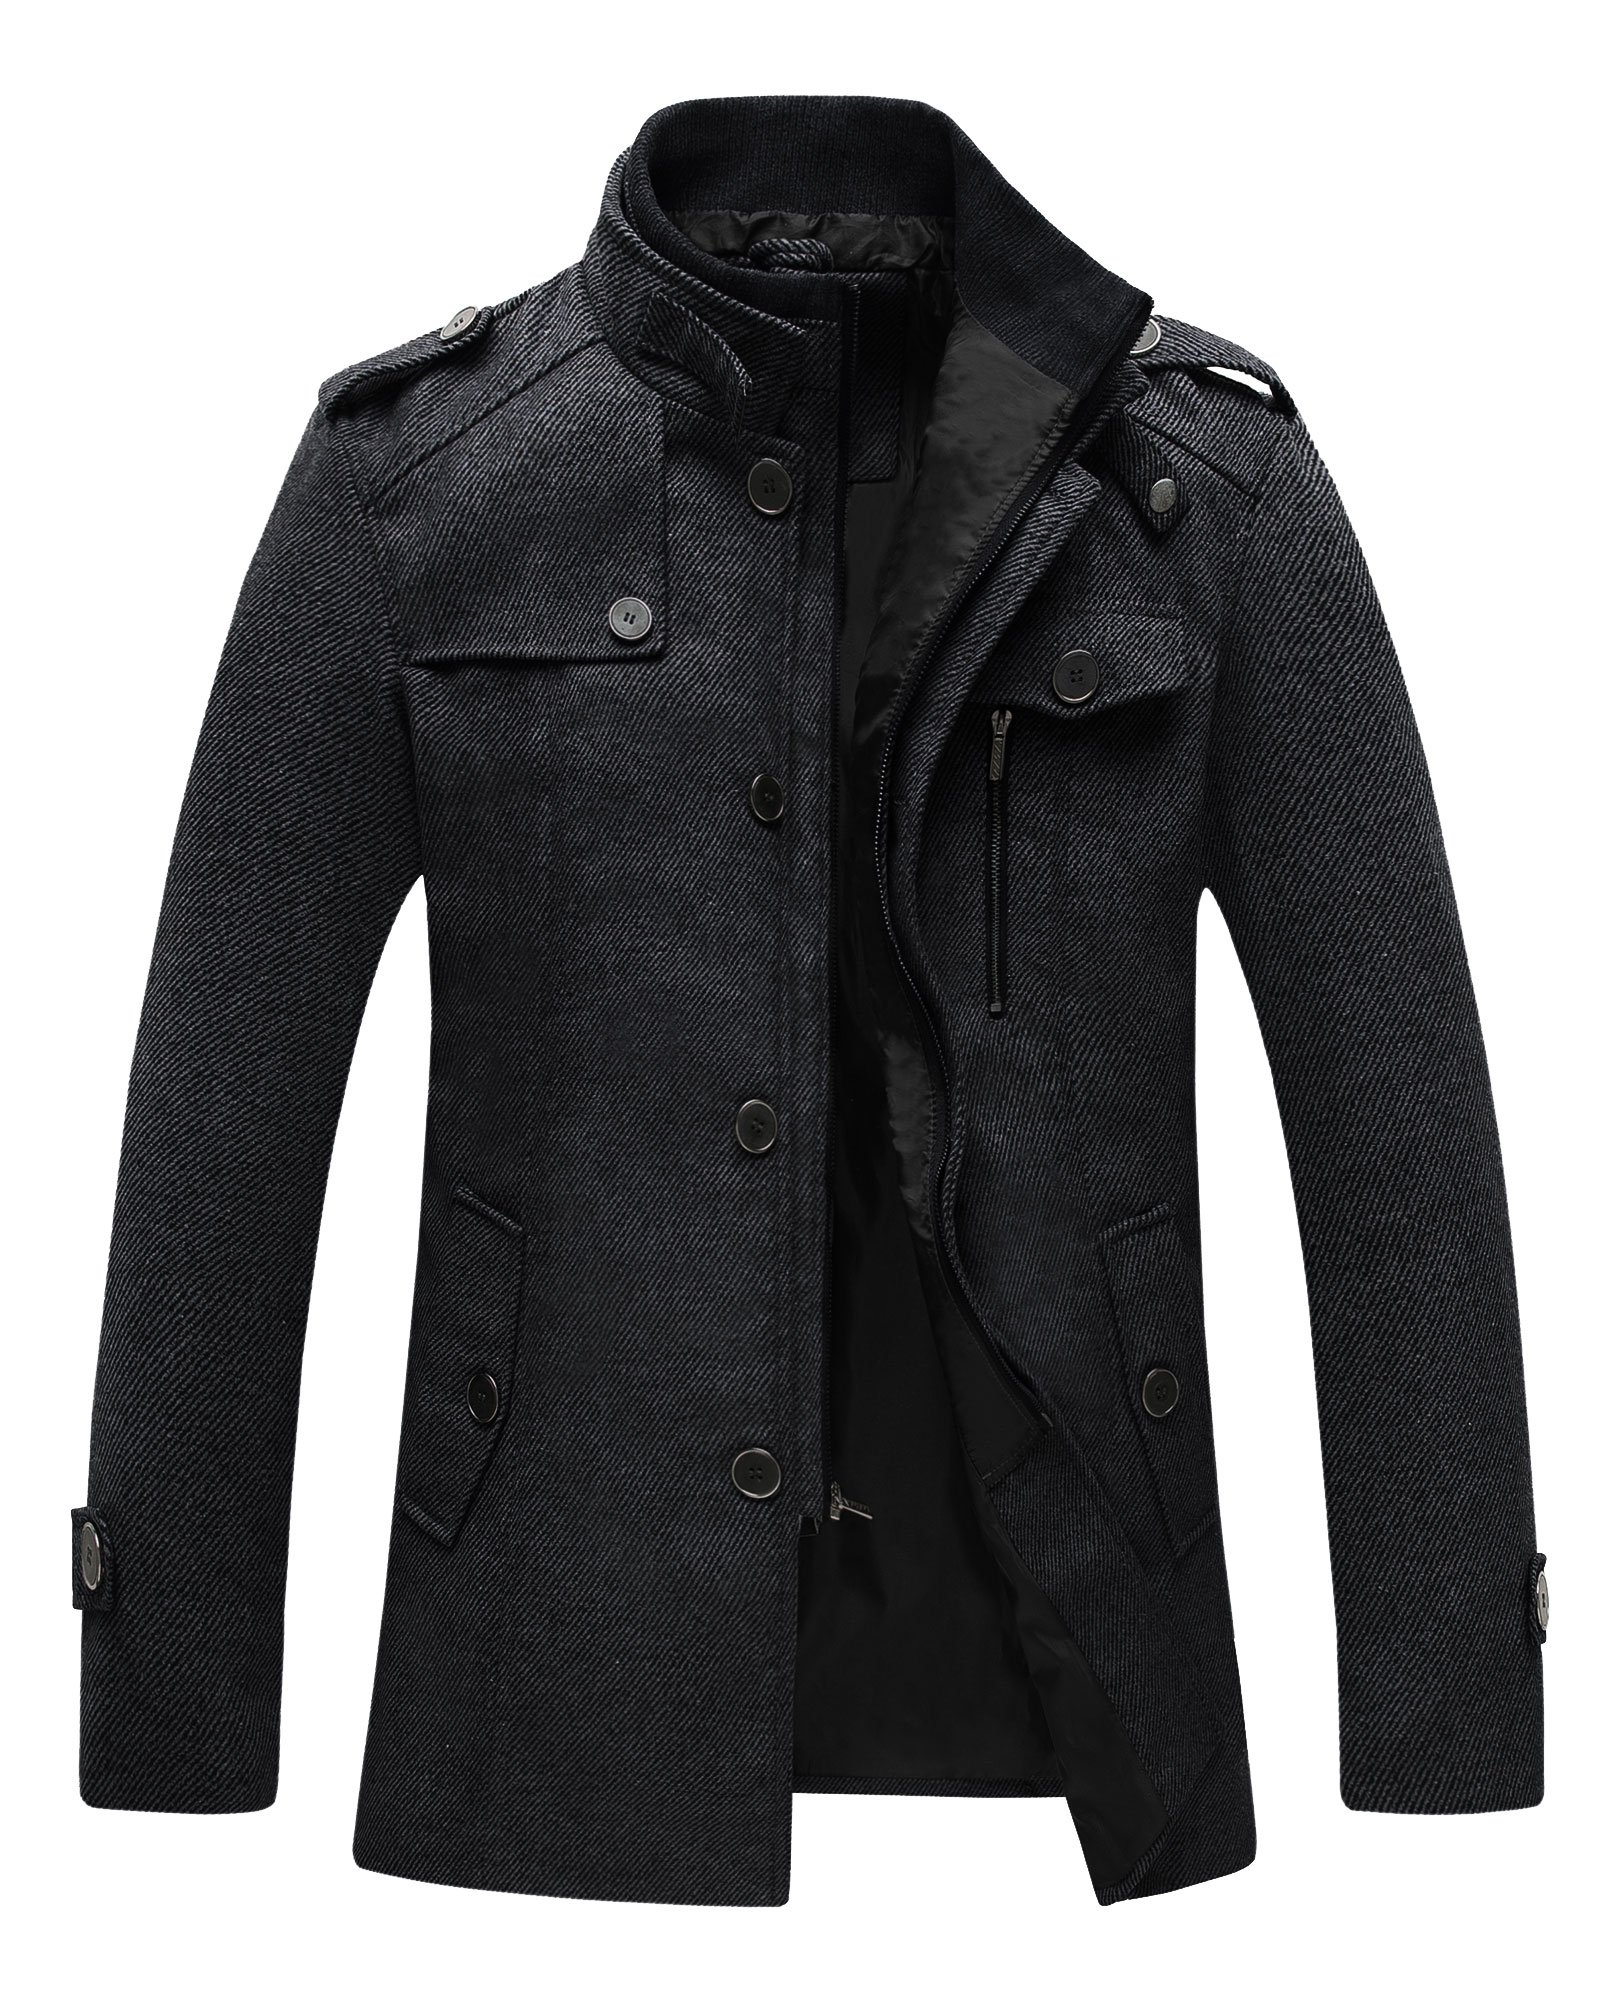 Wantdo Men's Cashmere Peacoat Business Casual Wool Jacket Overcoat Black L by Wantdo